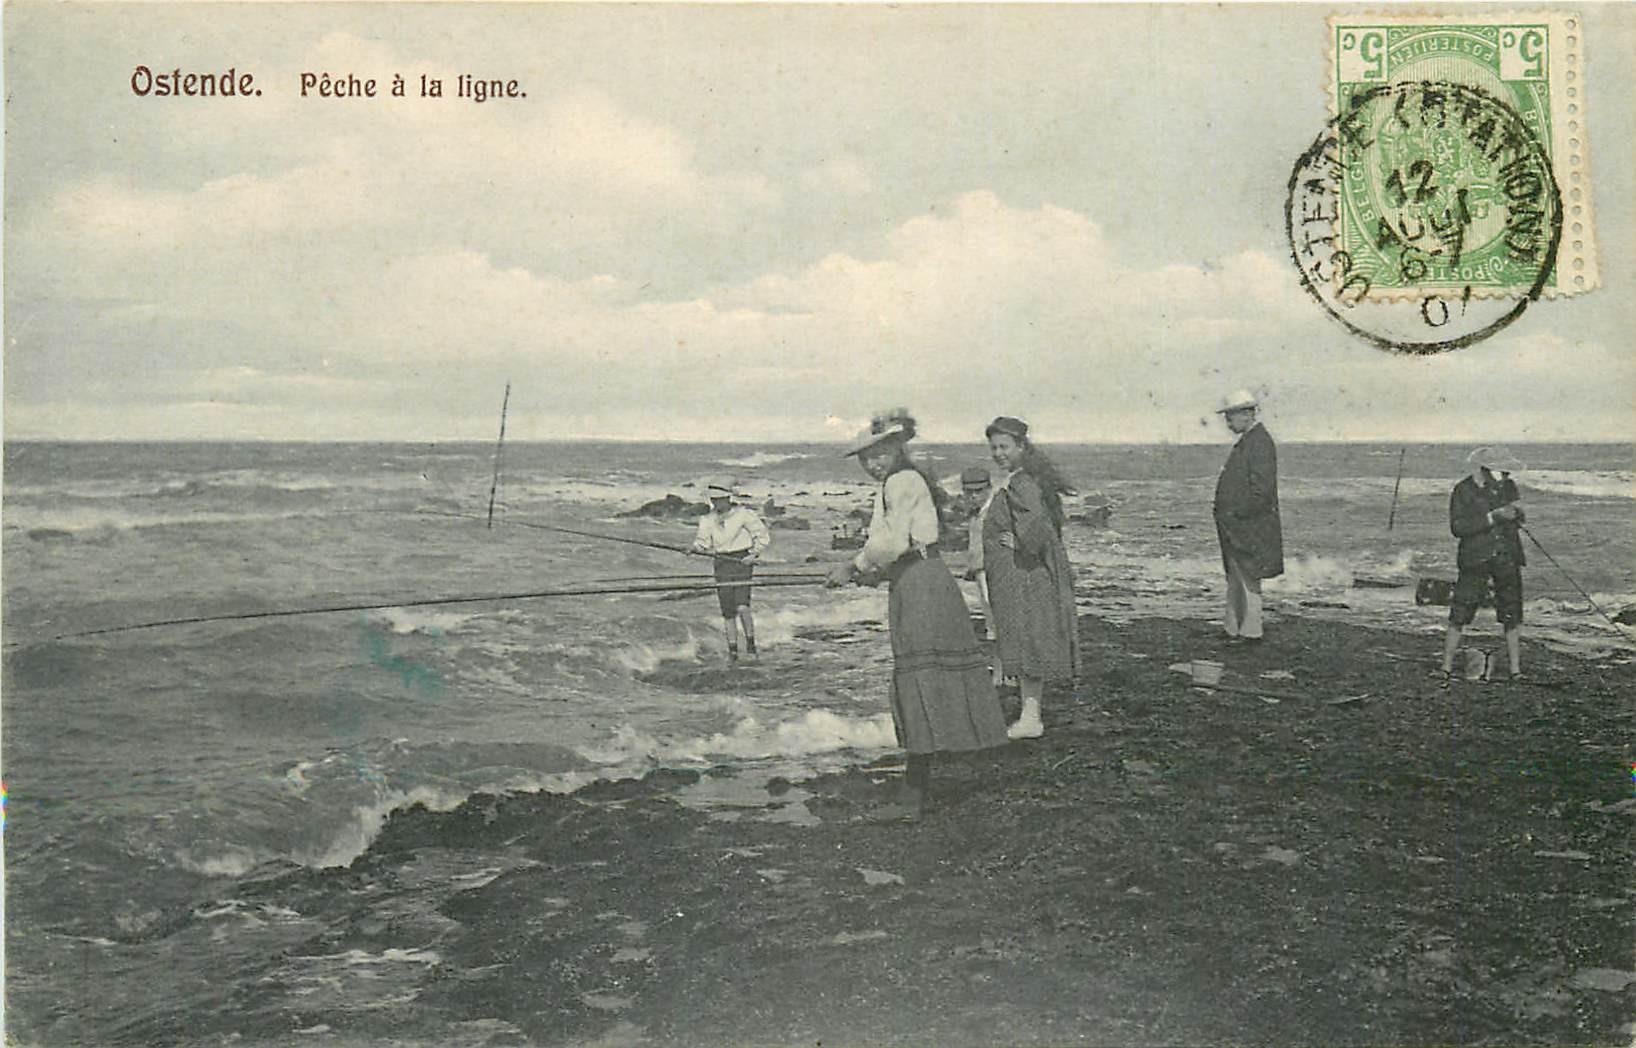 OSTENDE. Pêche à la ligne 1907